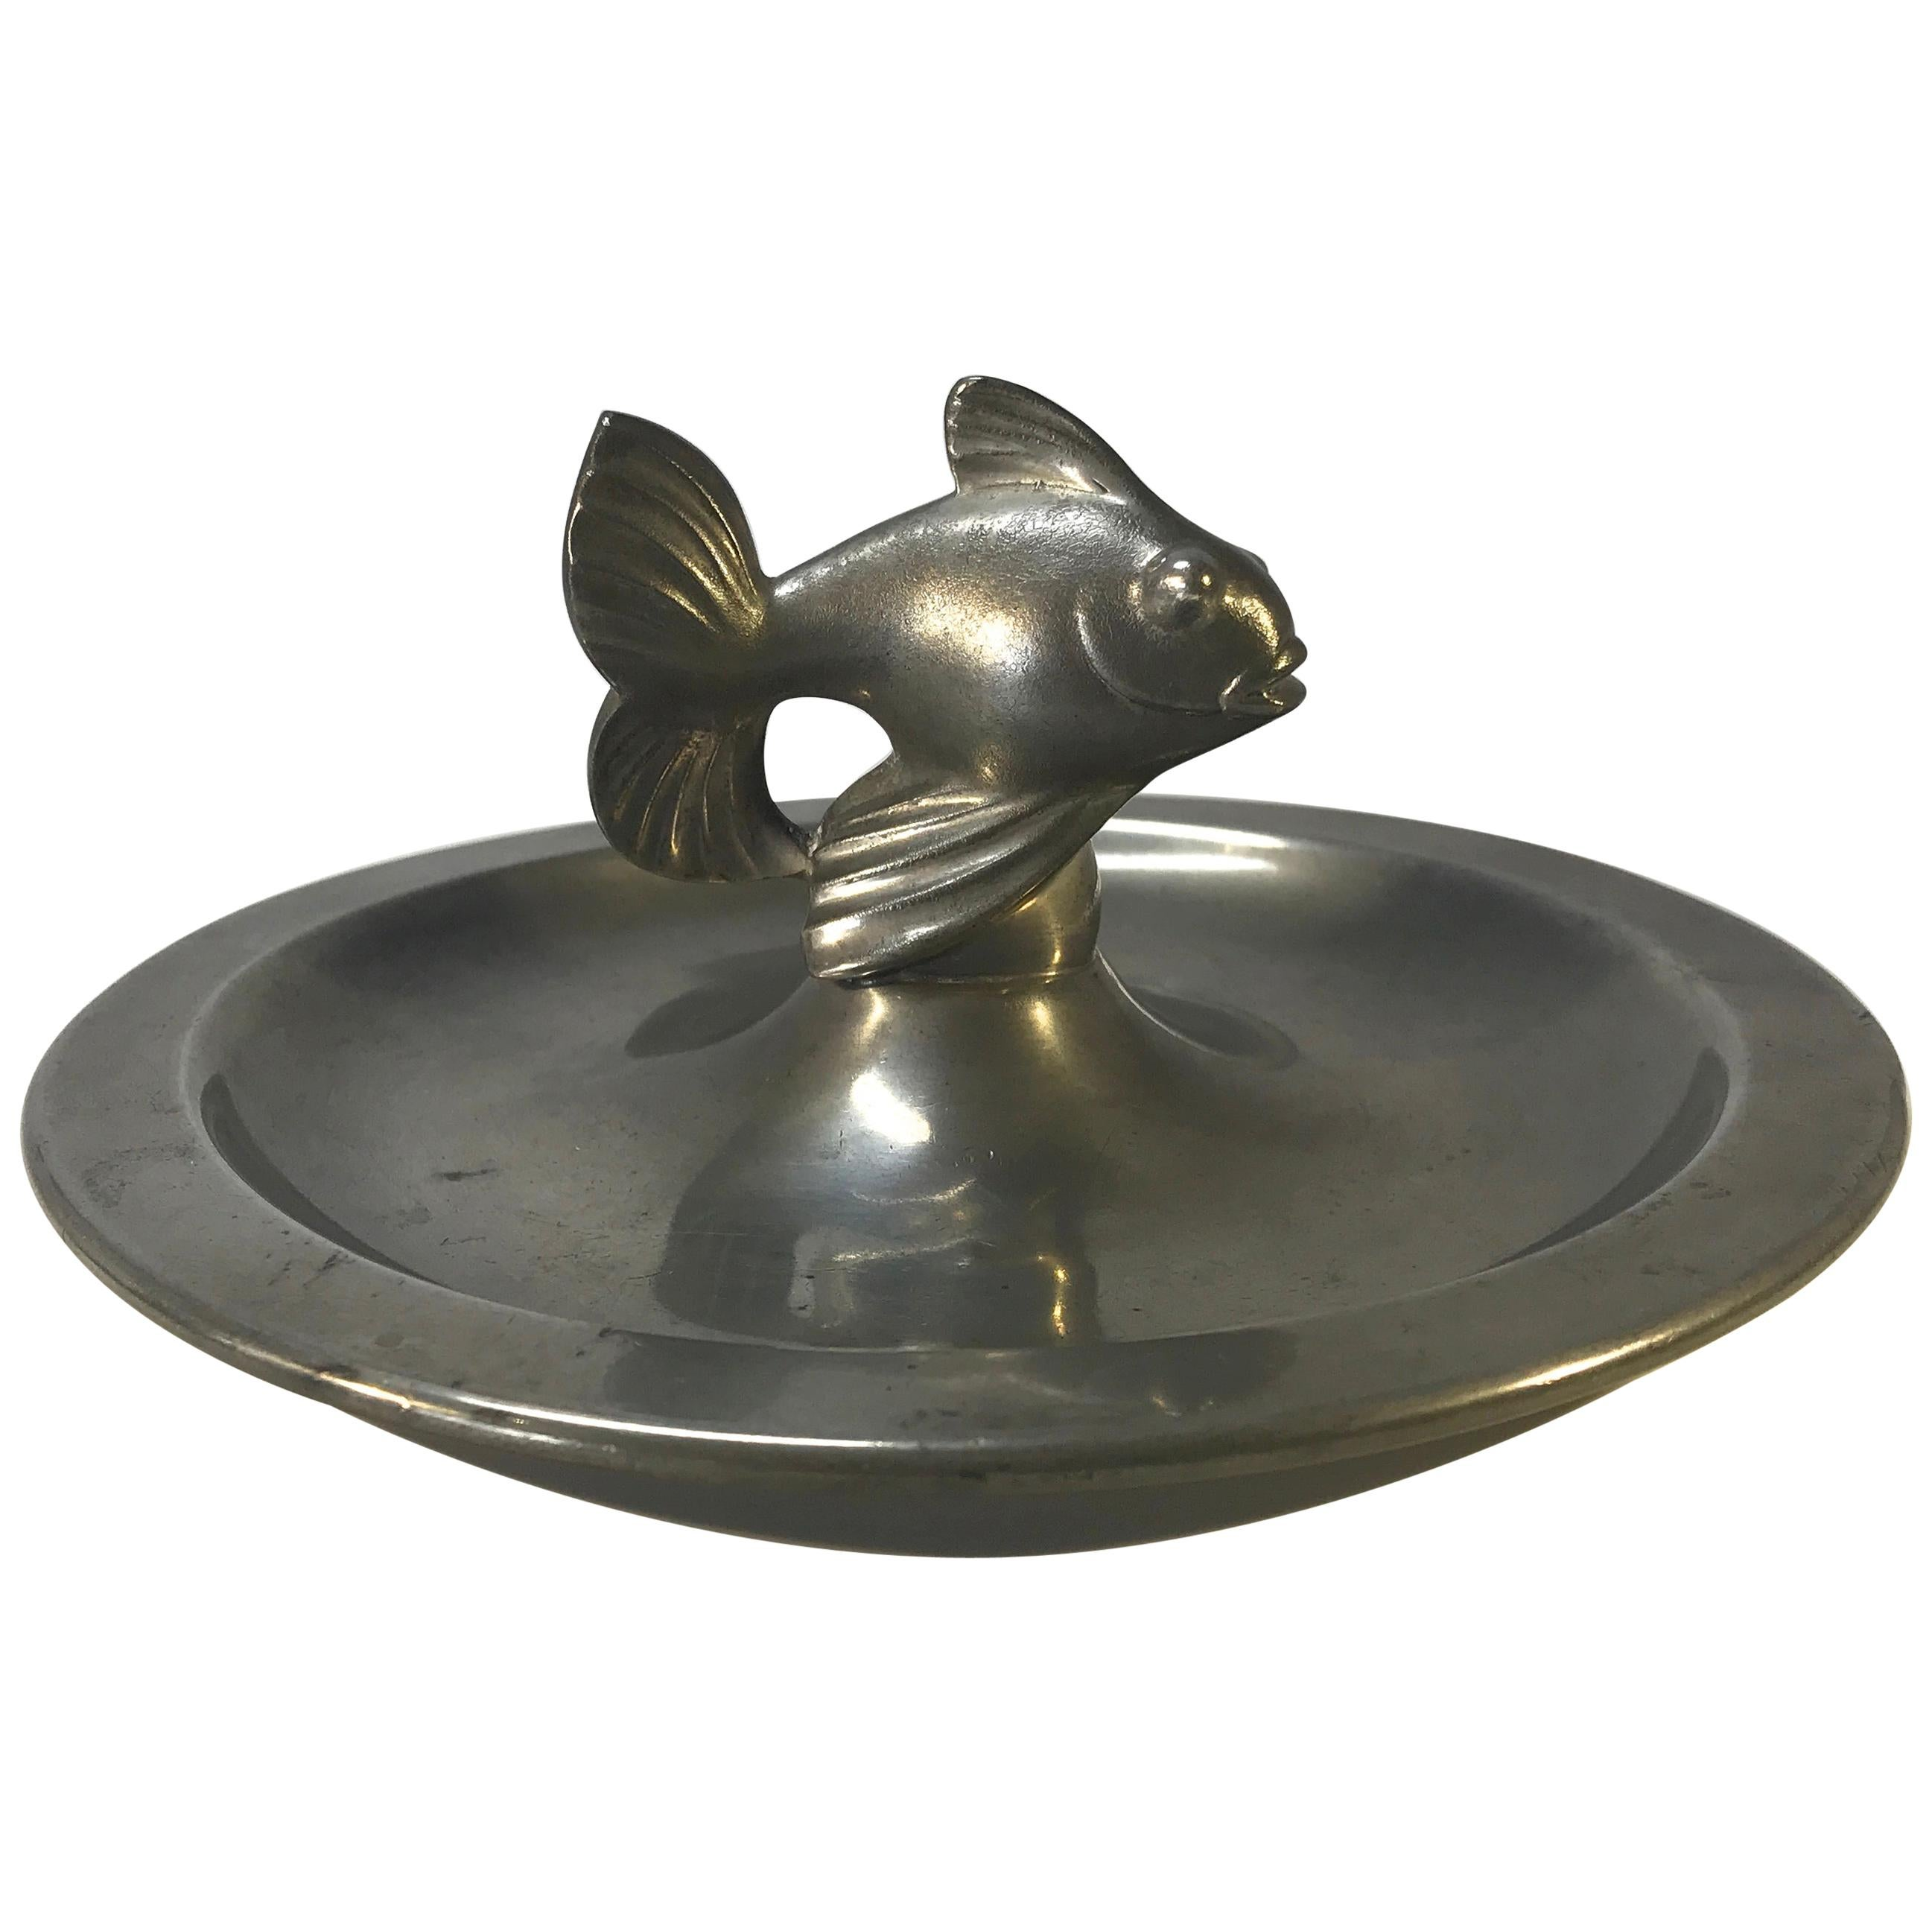 Just Andersen, Denmark 1930s Art Deco Pewter Stylized Fish Vide Poche #1656P